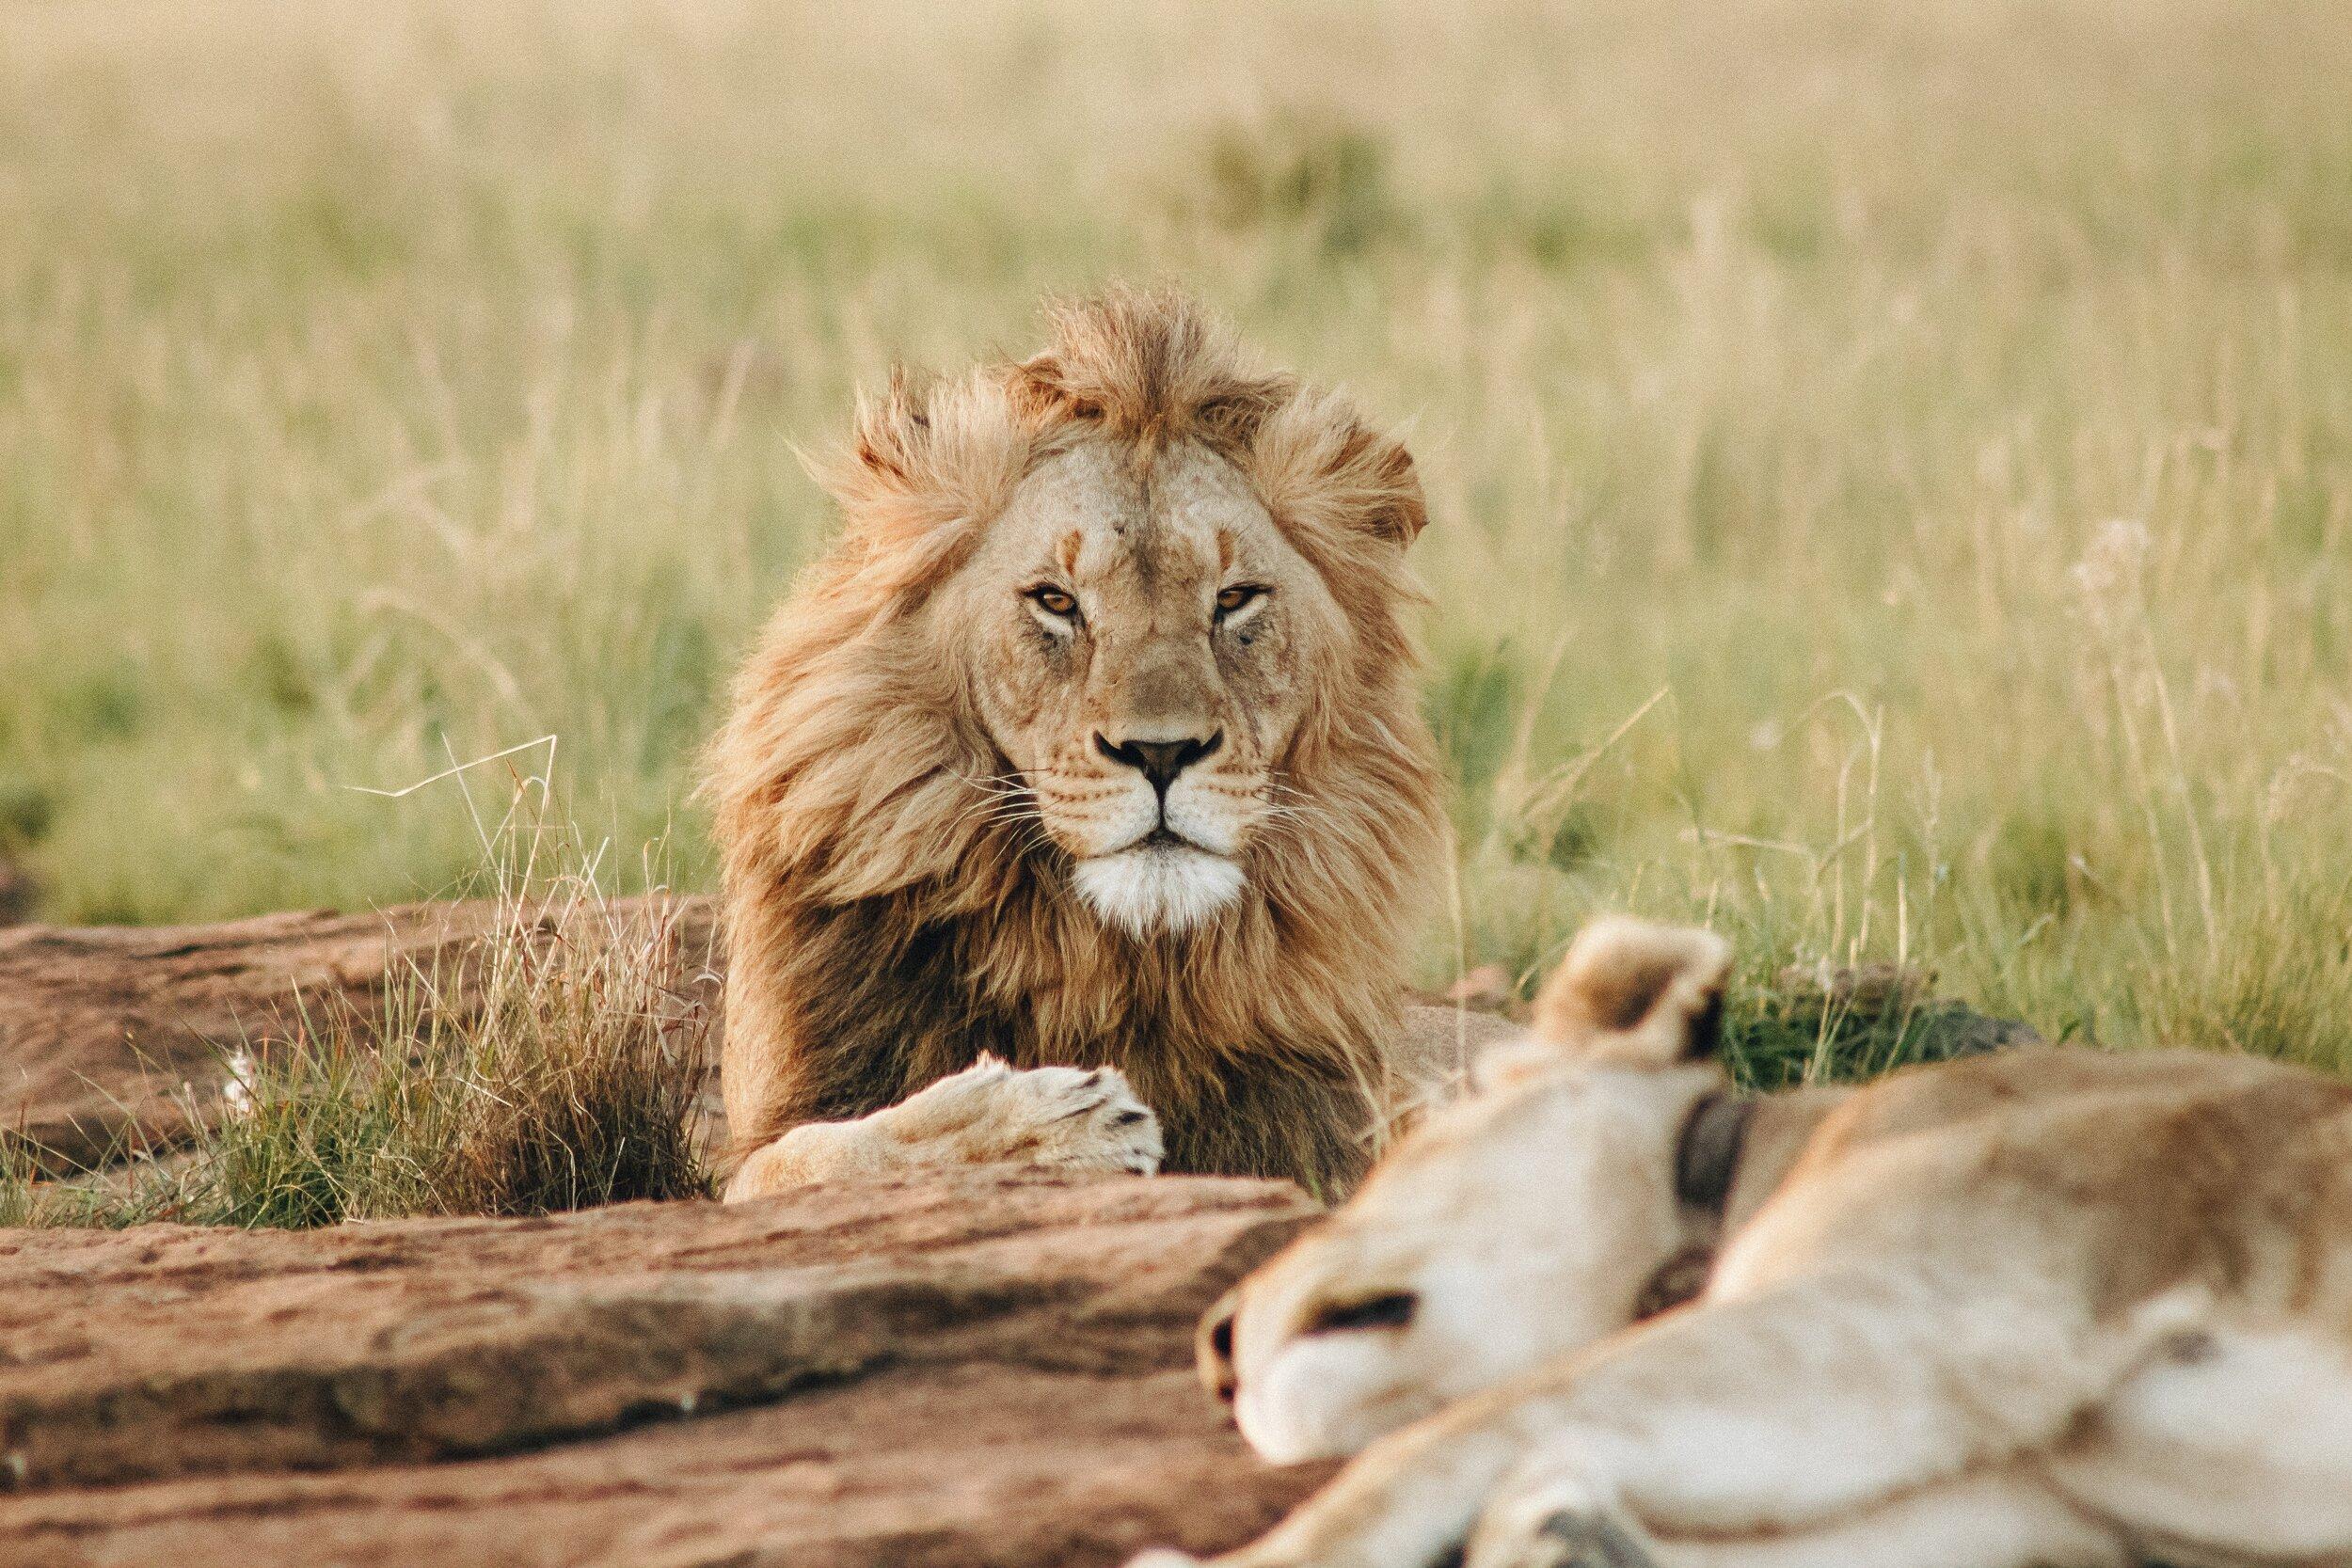 Wild Animal Safari Inc